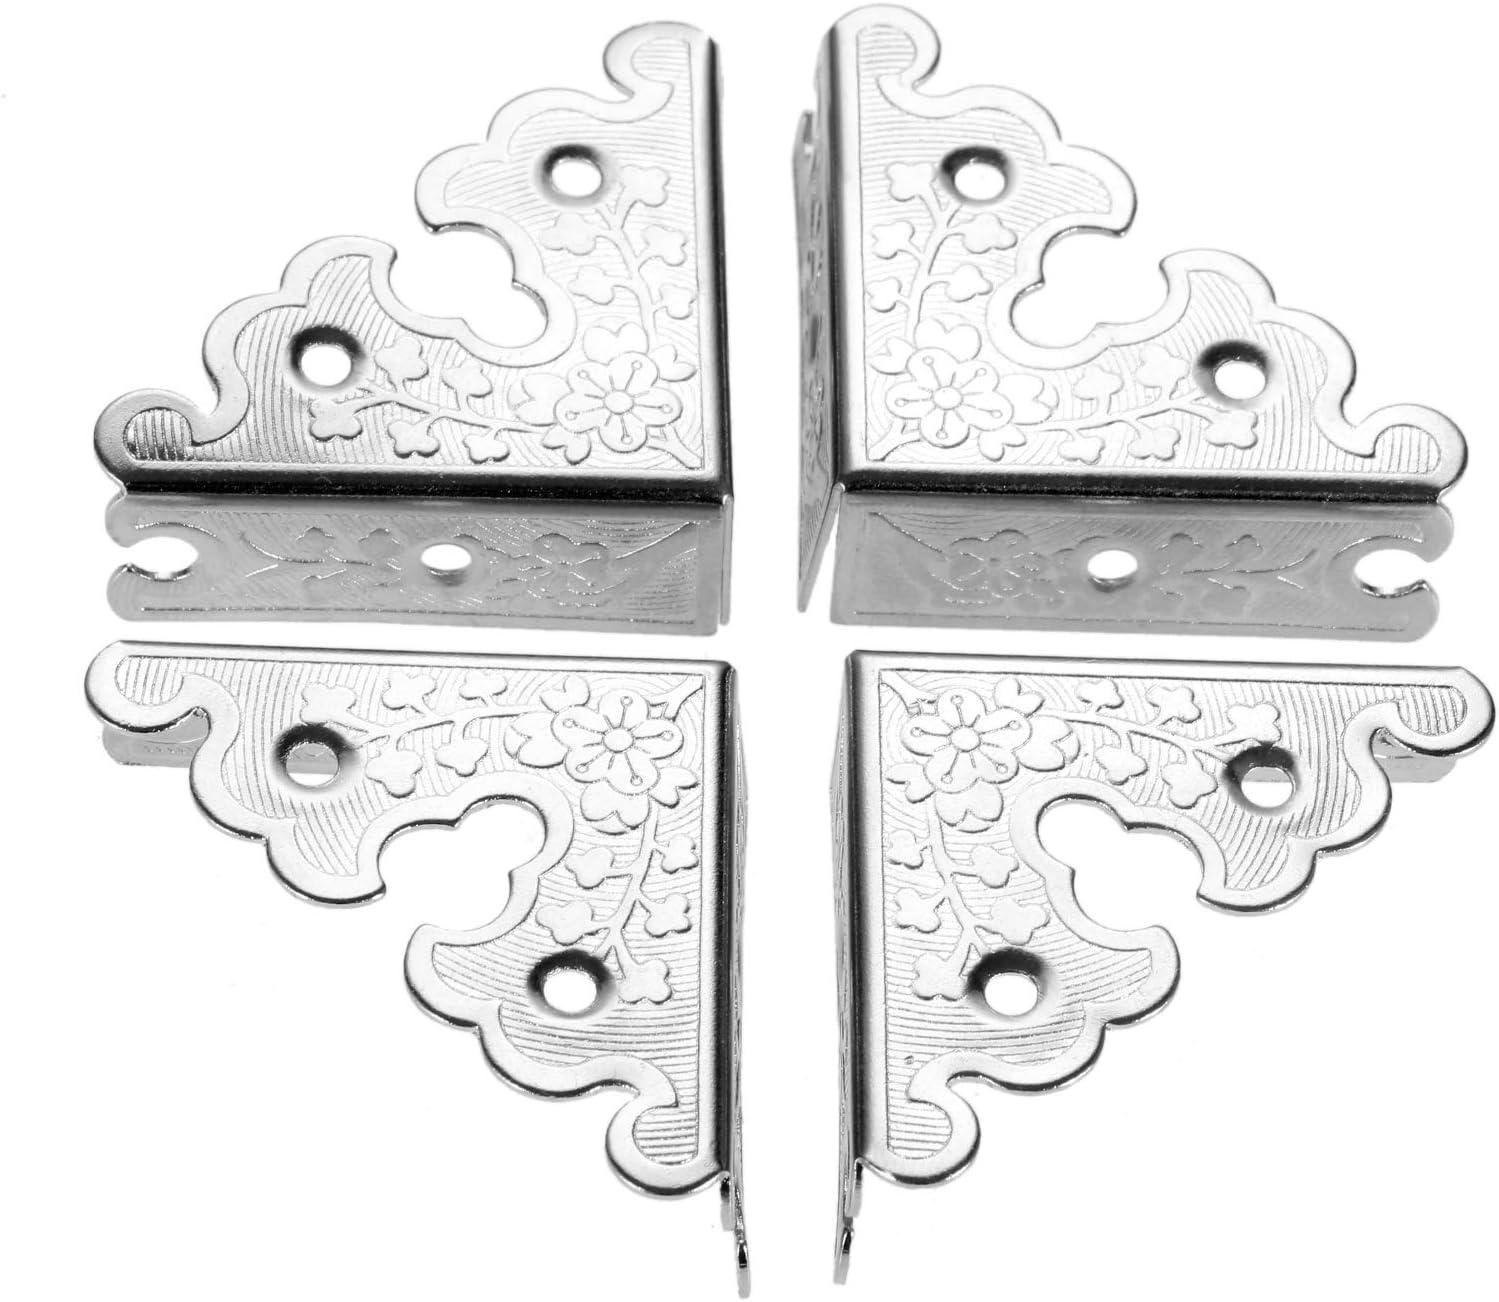 4Pcs Jewelry Wooden Box Chest Protector E Popularity Furniture Guard Cheap bargain Corner